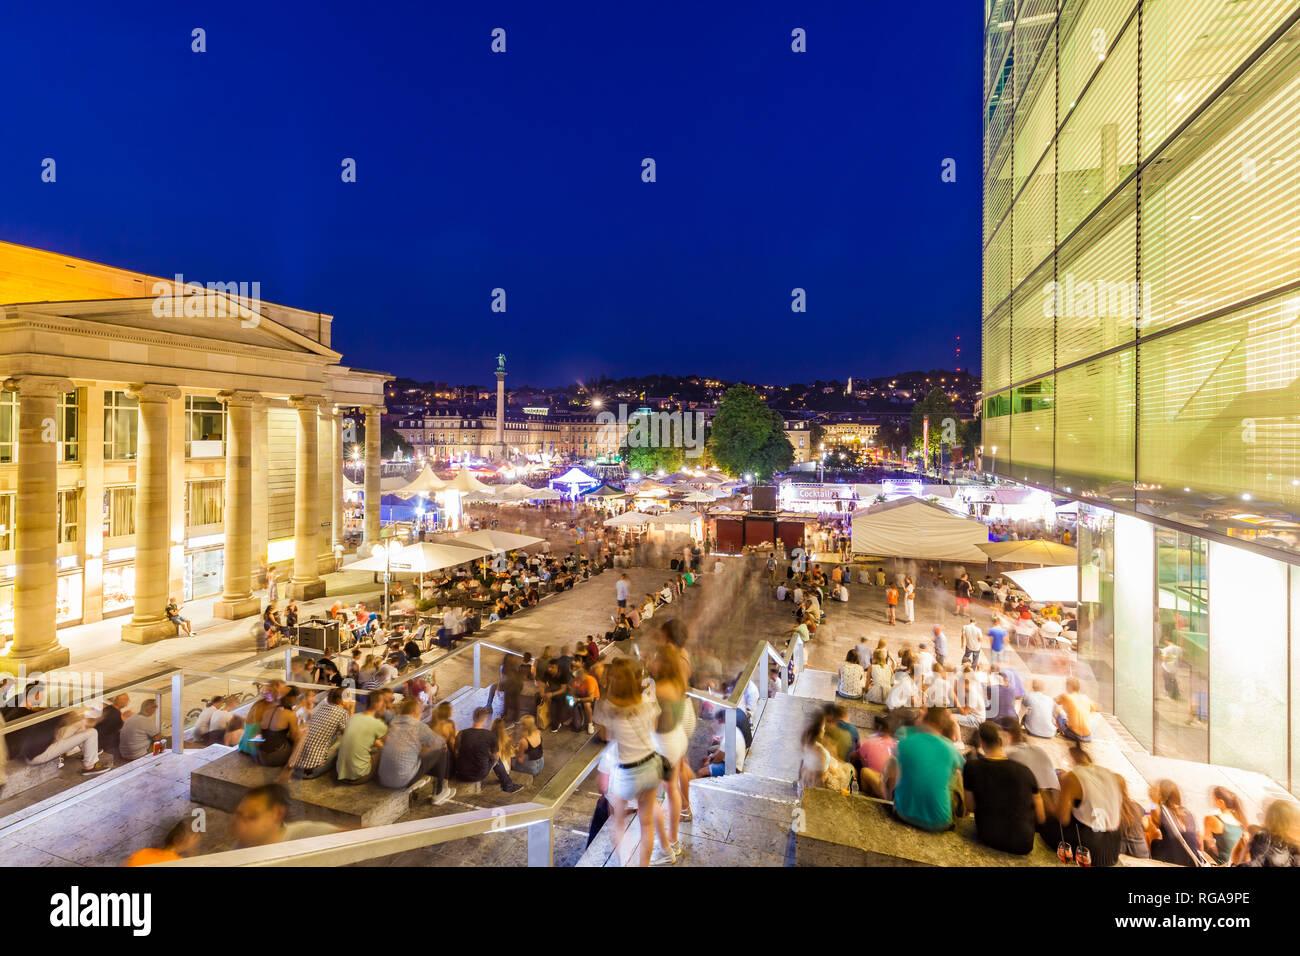 Germany, Stuttgart, Schlossplatz, New Palace, Koenigsbau, Art Musuem during summer party, blue hour Stock Photo